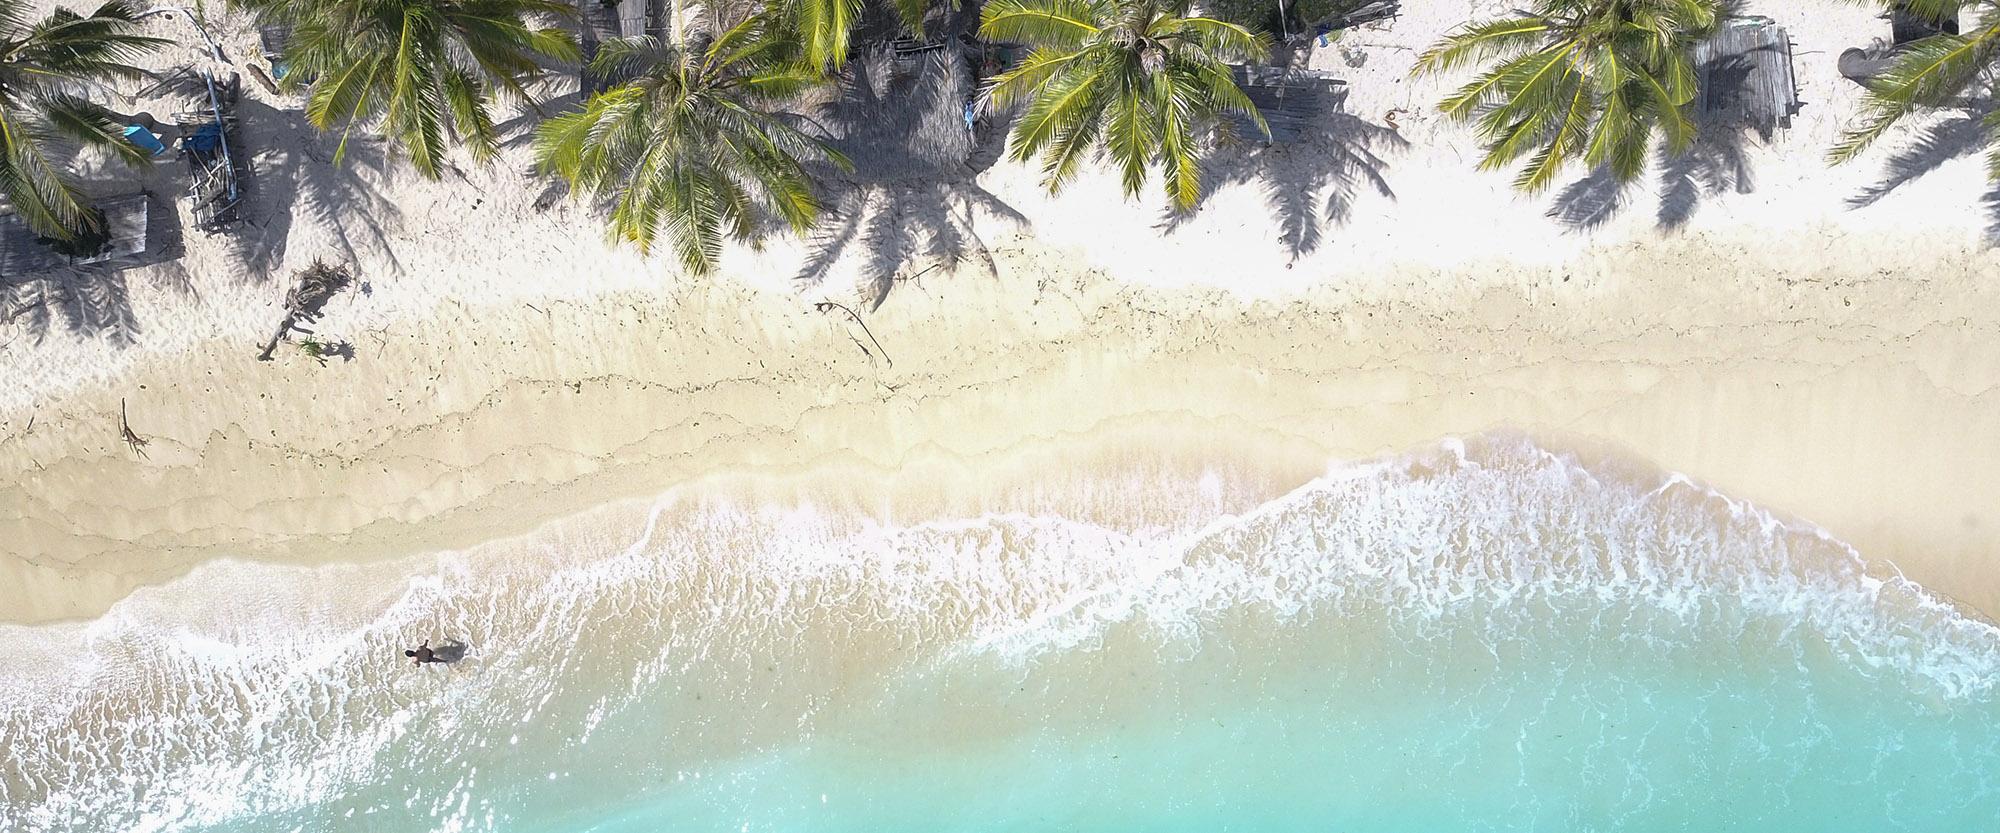 beach waves ocean sand nemberala besialu t land indonesia rote island